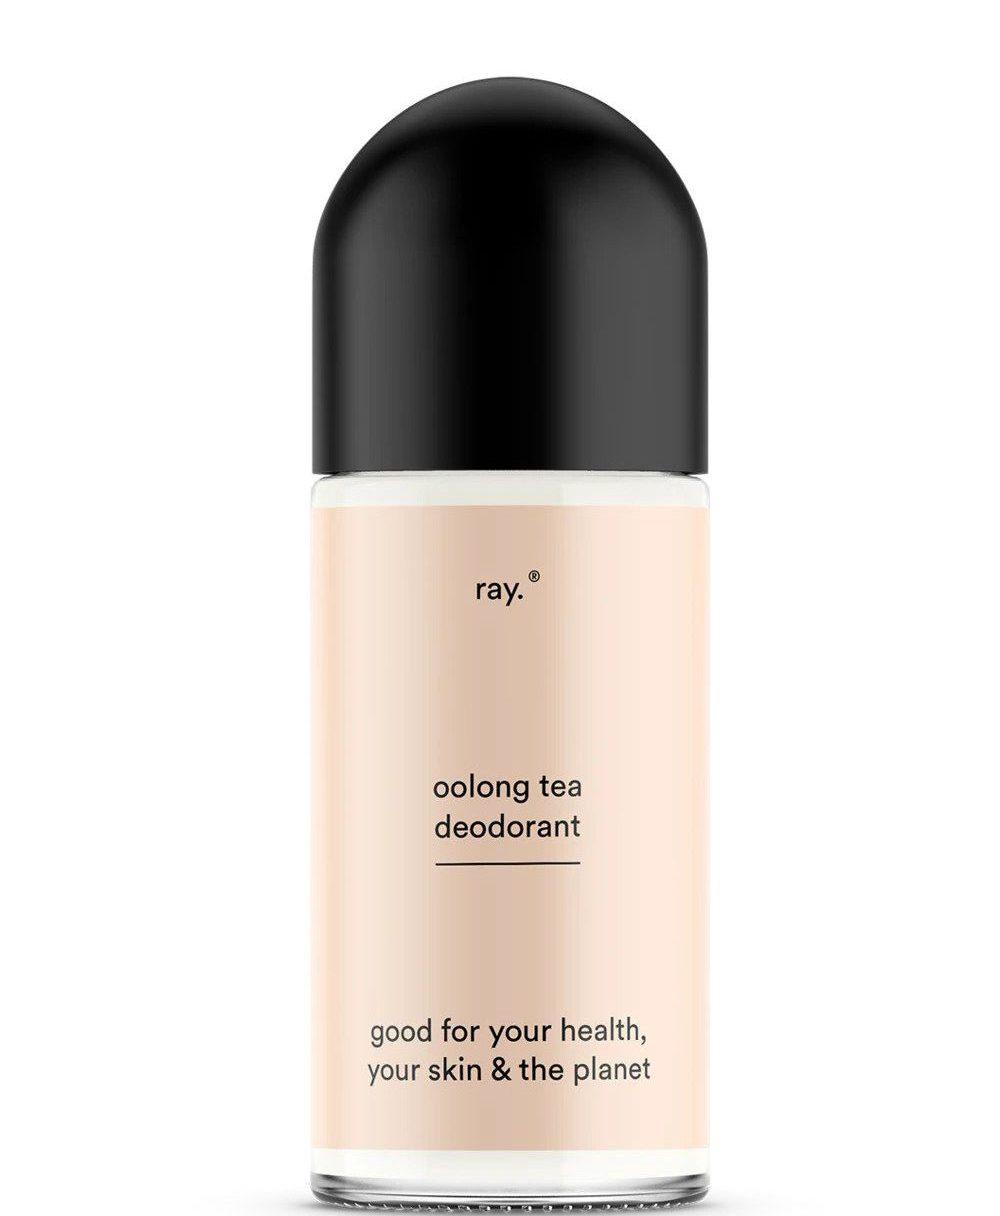 Ray deodorant